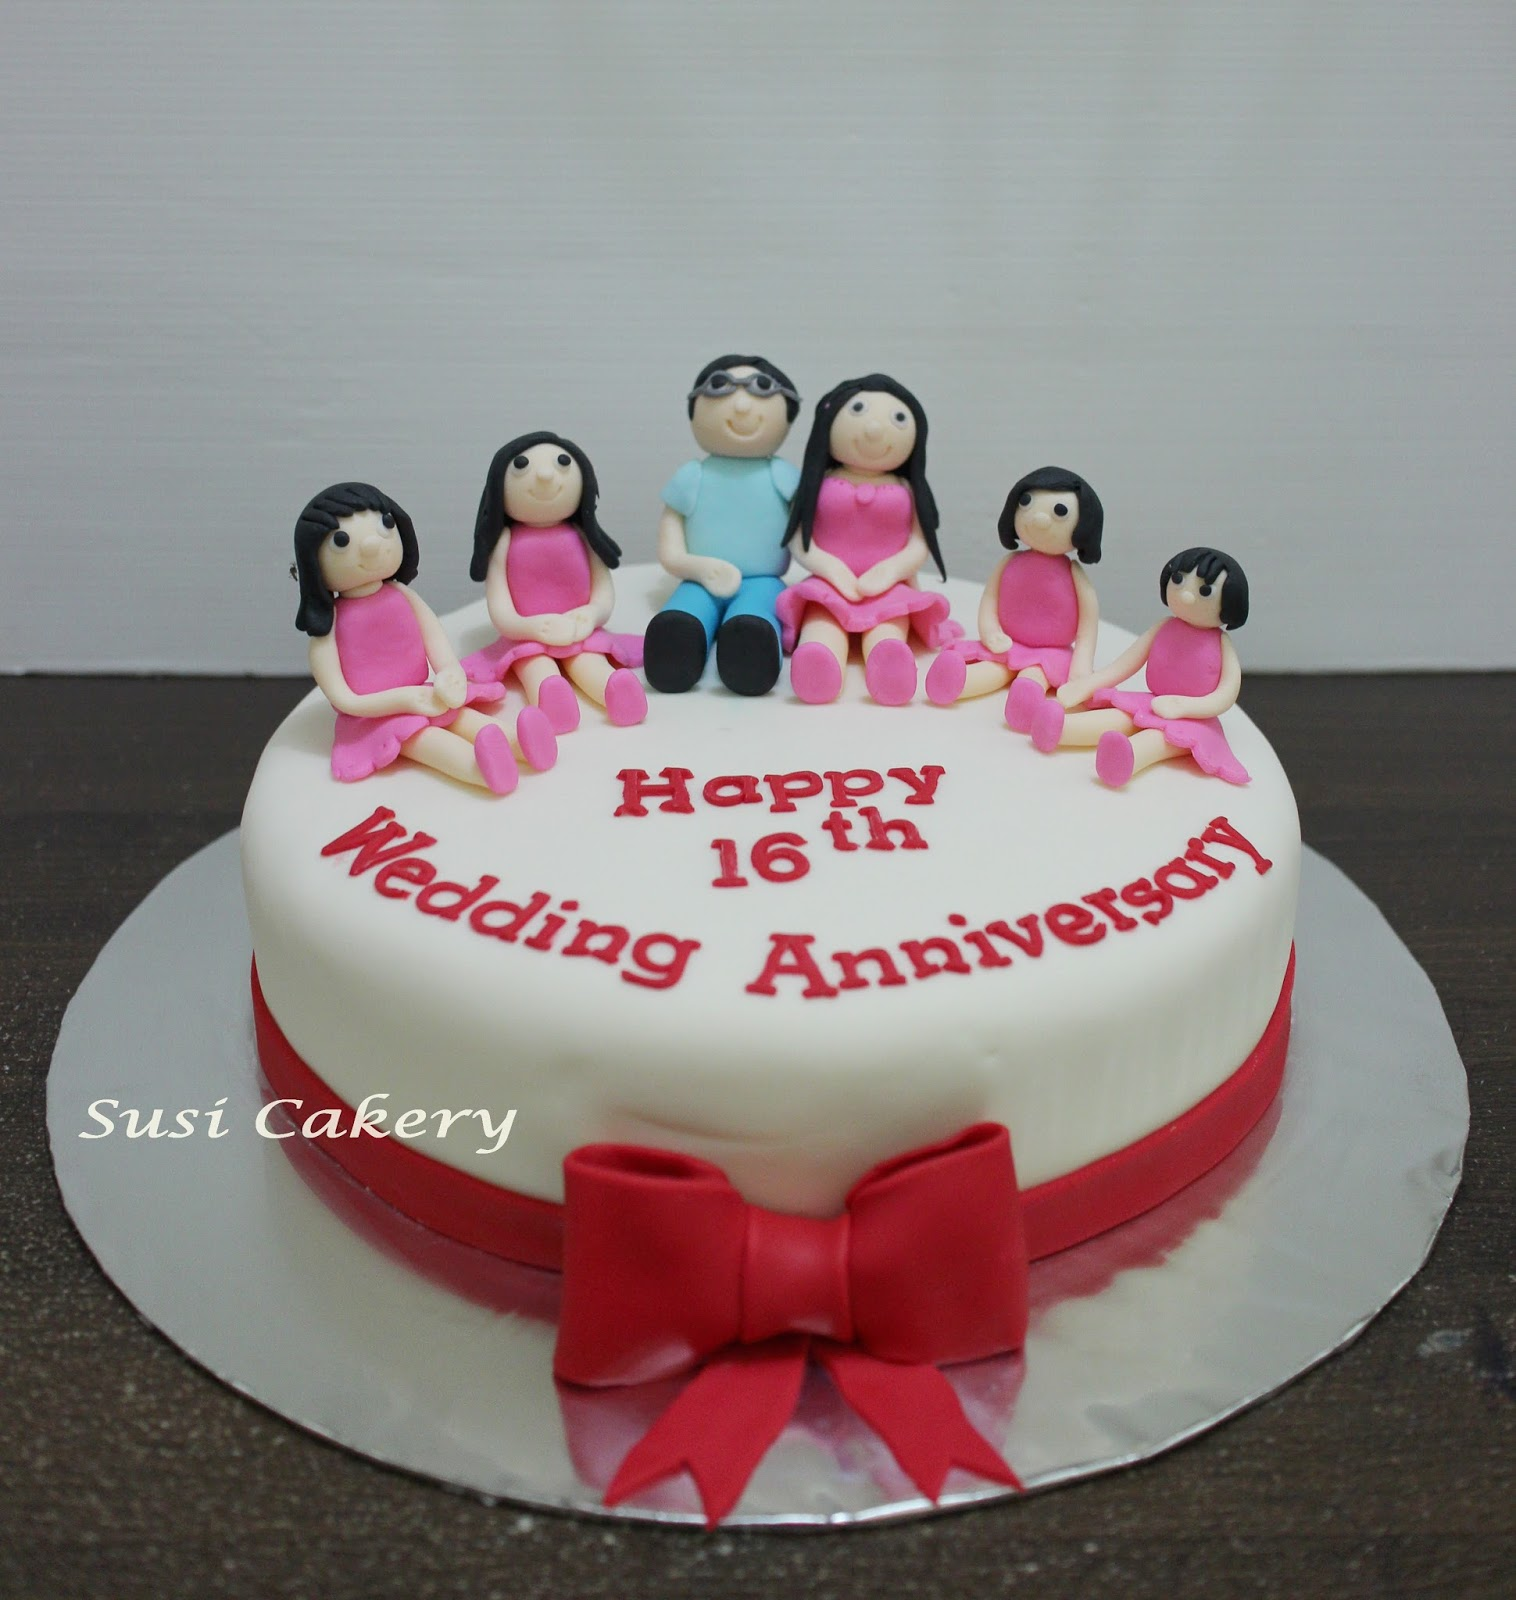 Susi Cakery Happy 16th Wedding Anniversary Cake